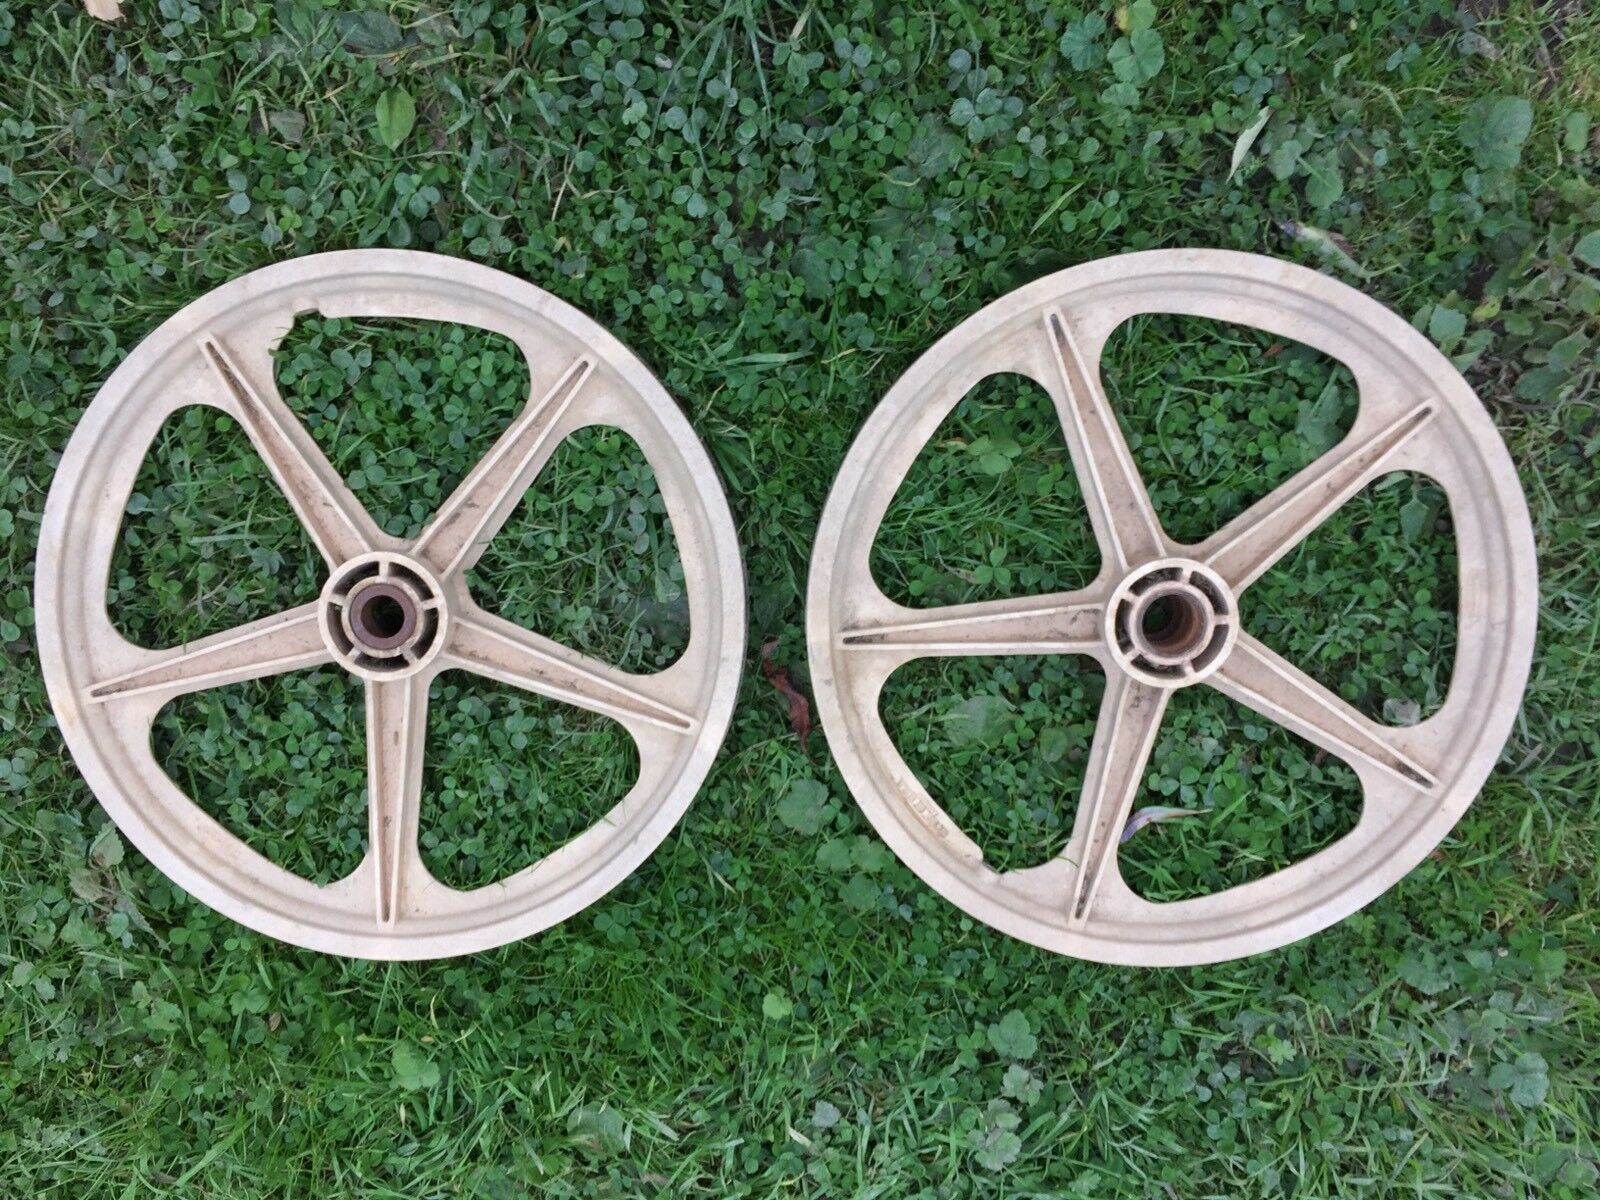 Vintage Rare Skyway BMX Mag Wheels  1970's Stamped Rubbermaid  White 5 Spoke